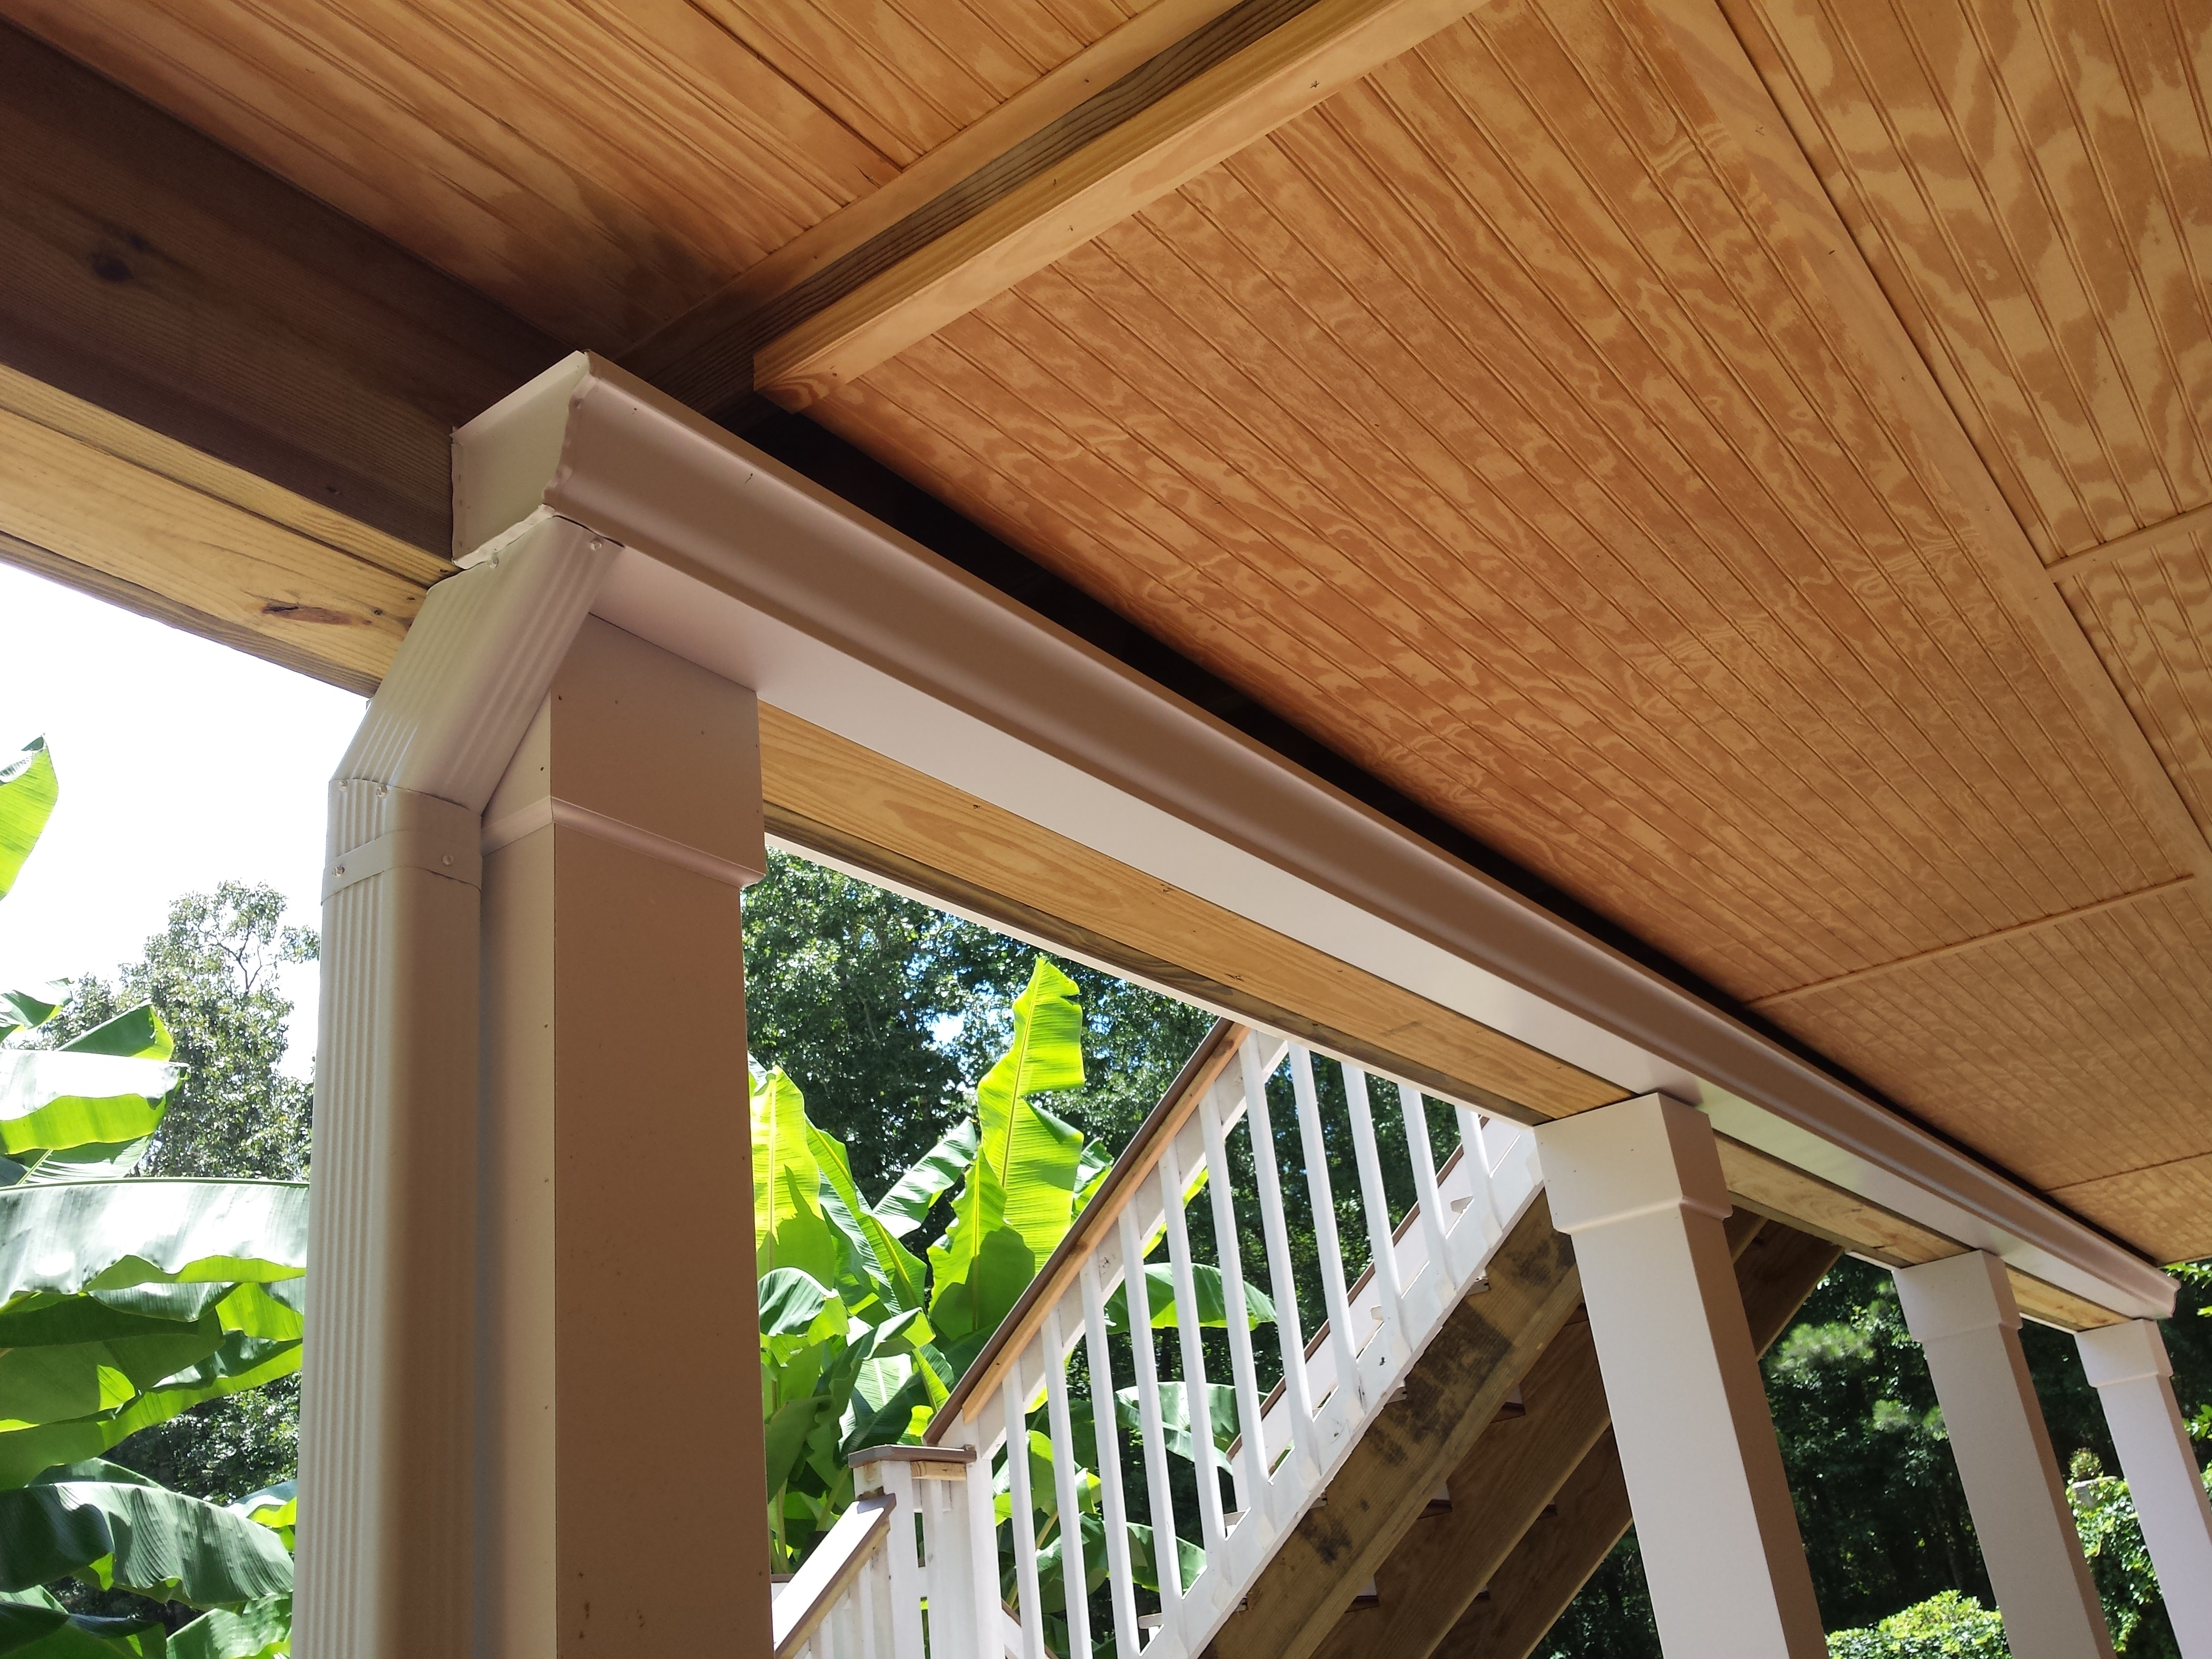 Central Ga Composite Decks Archadeck Of Trex Deck Wiring Diagrams Macon Rain Escape After Ceiling Instalation